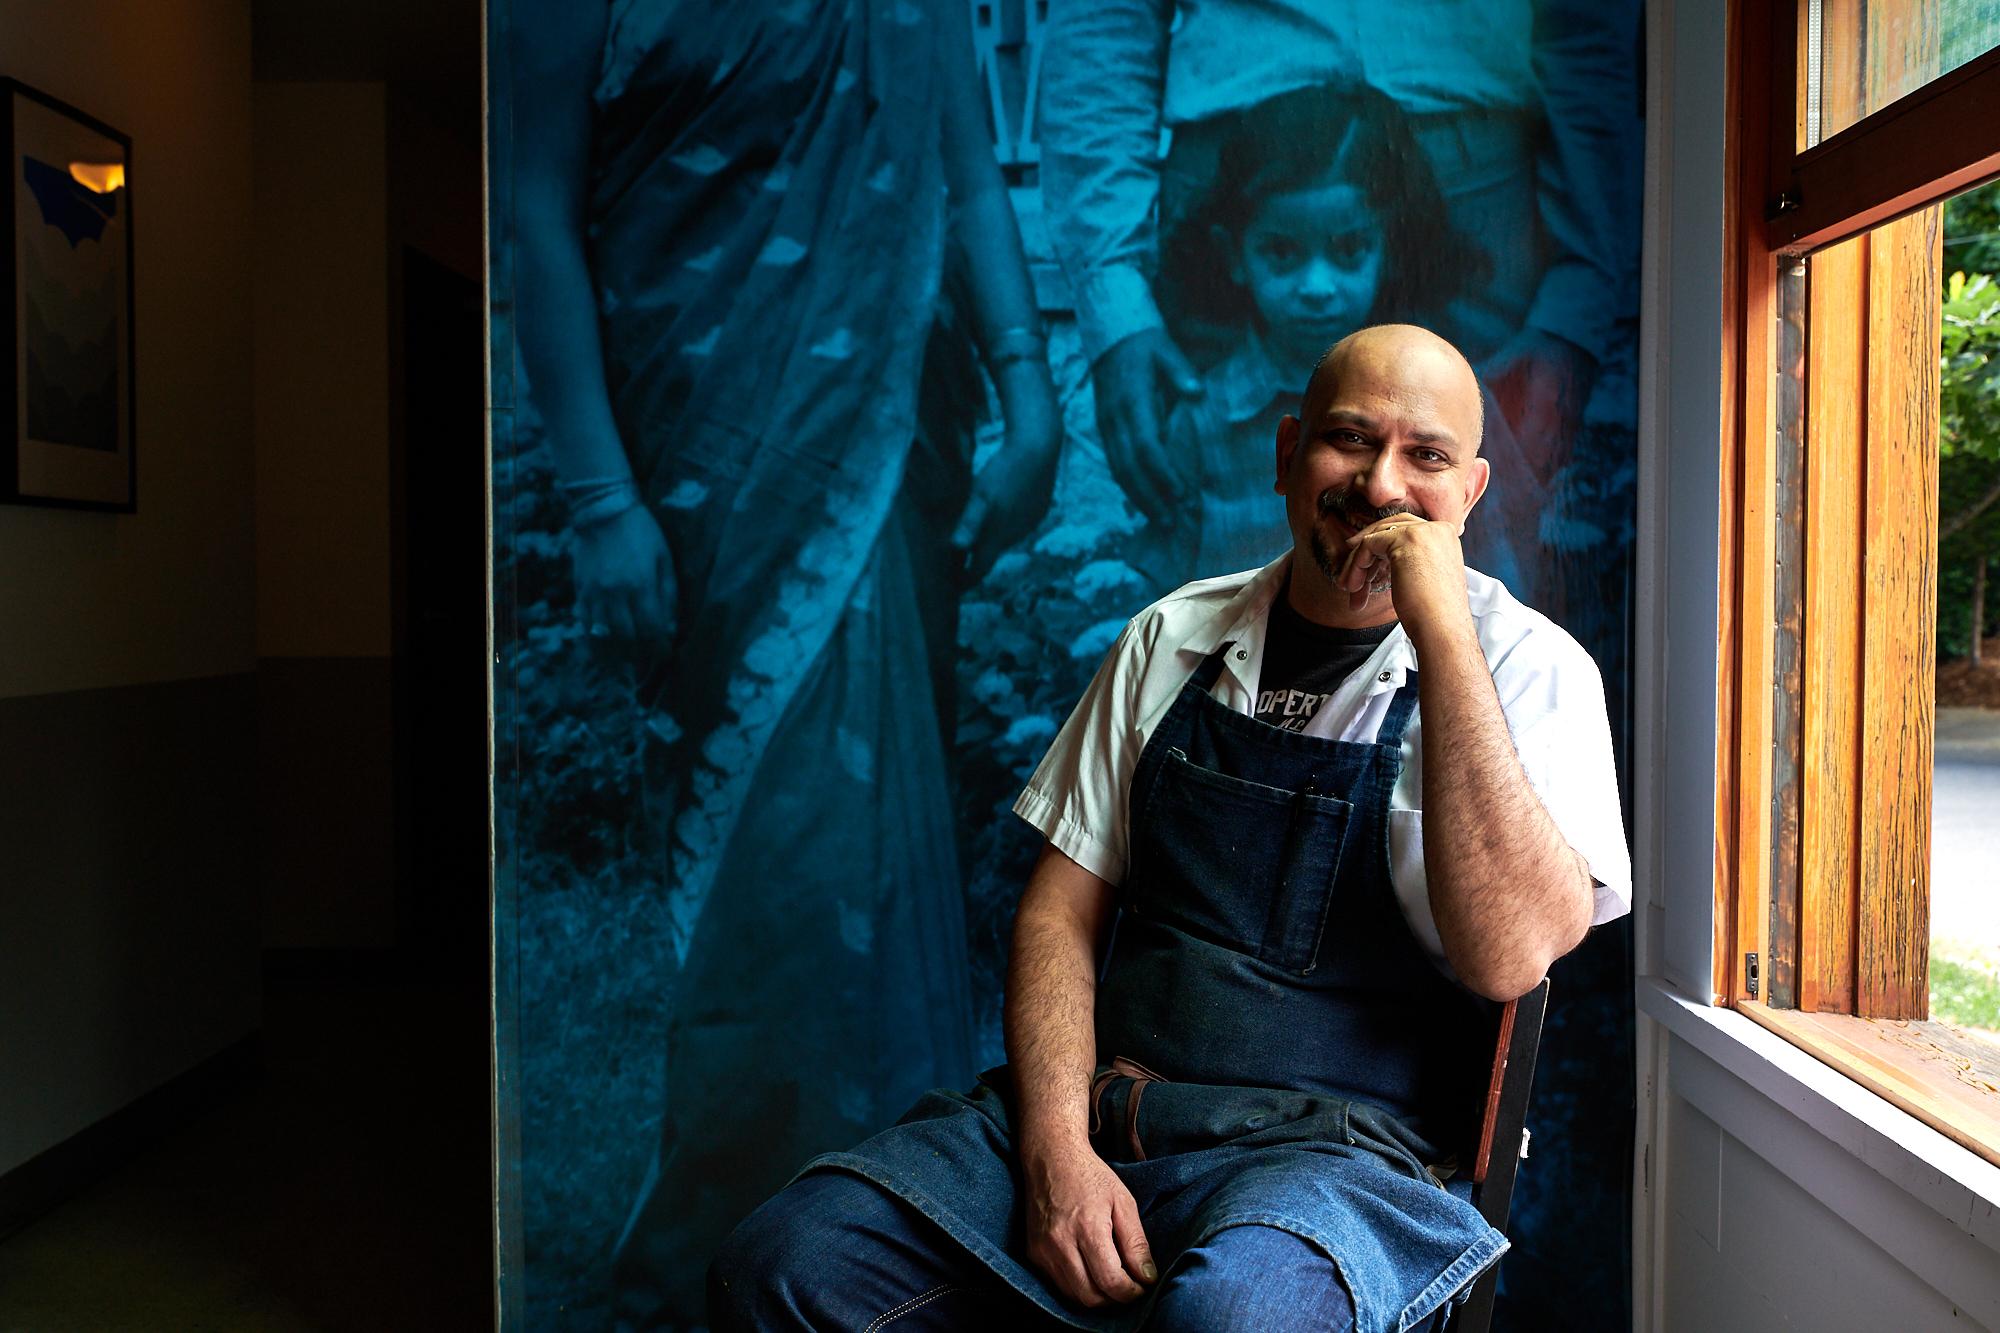 Deepak Kaul, owner and chef of Bhuna